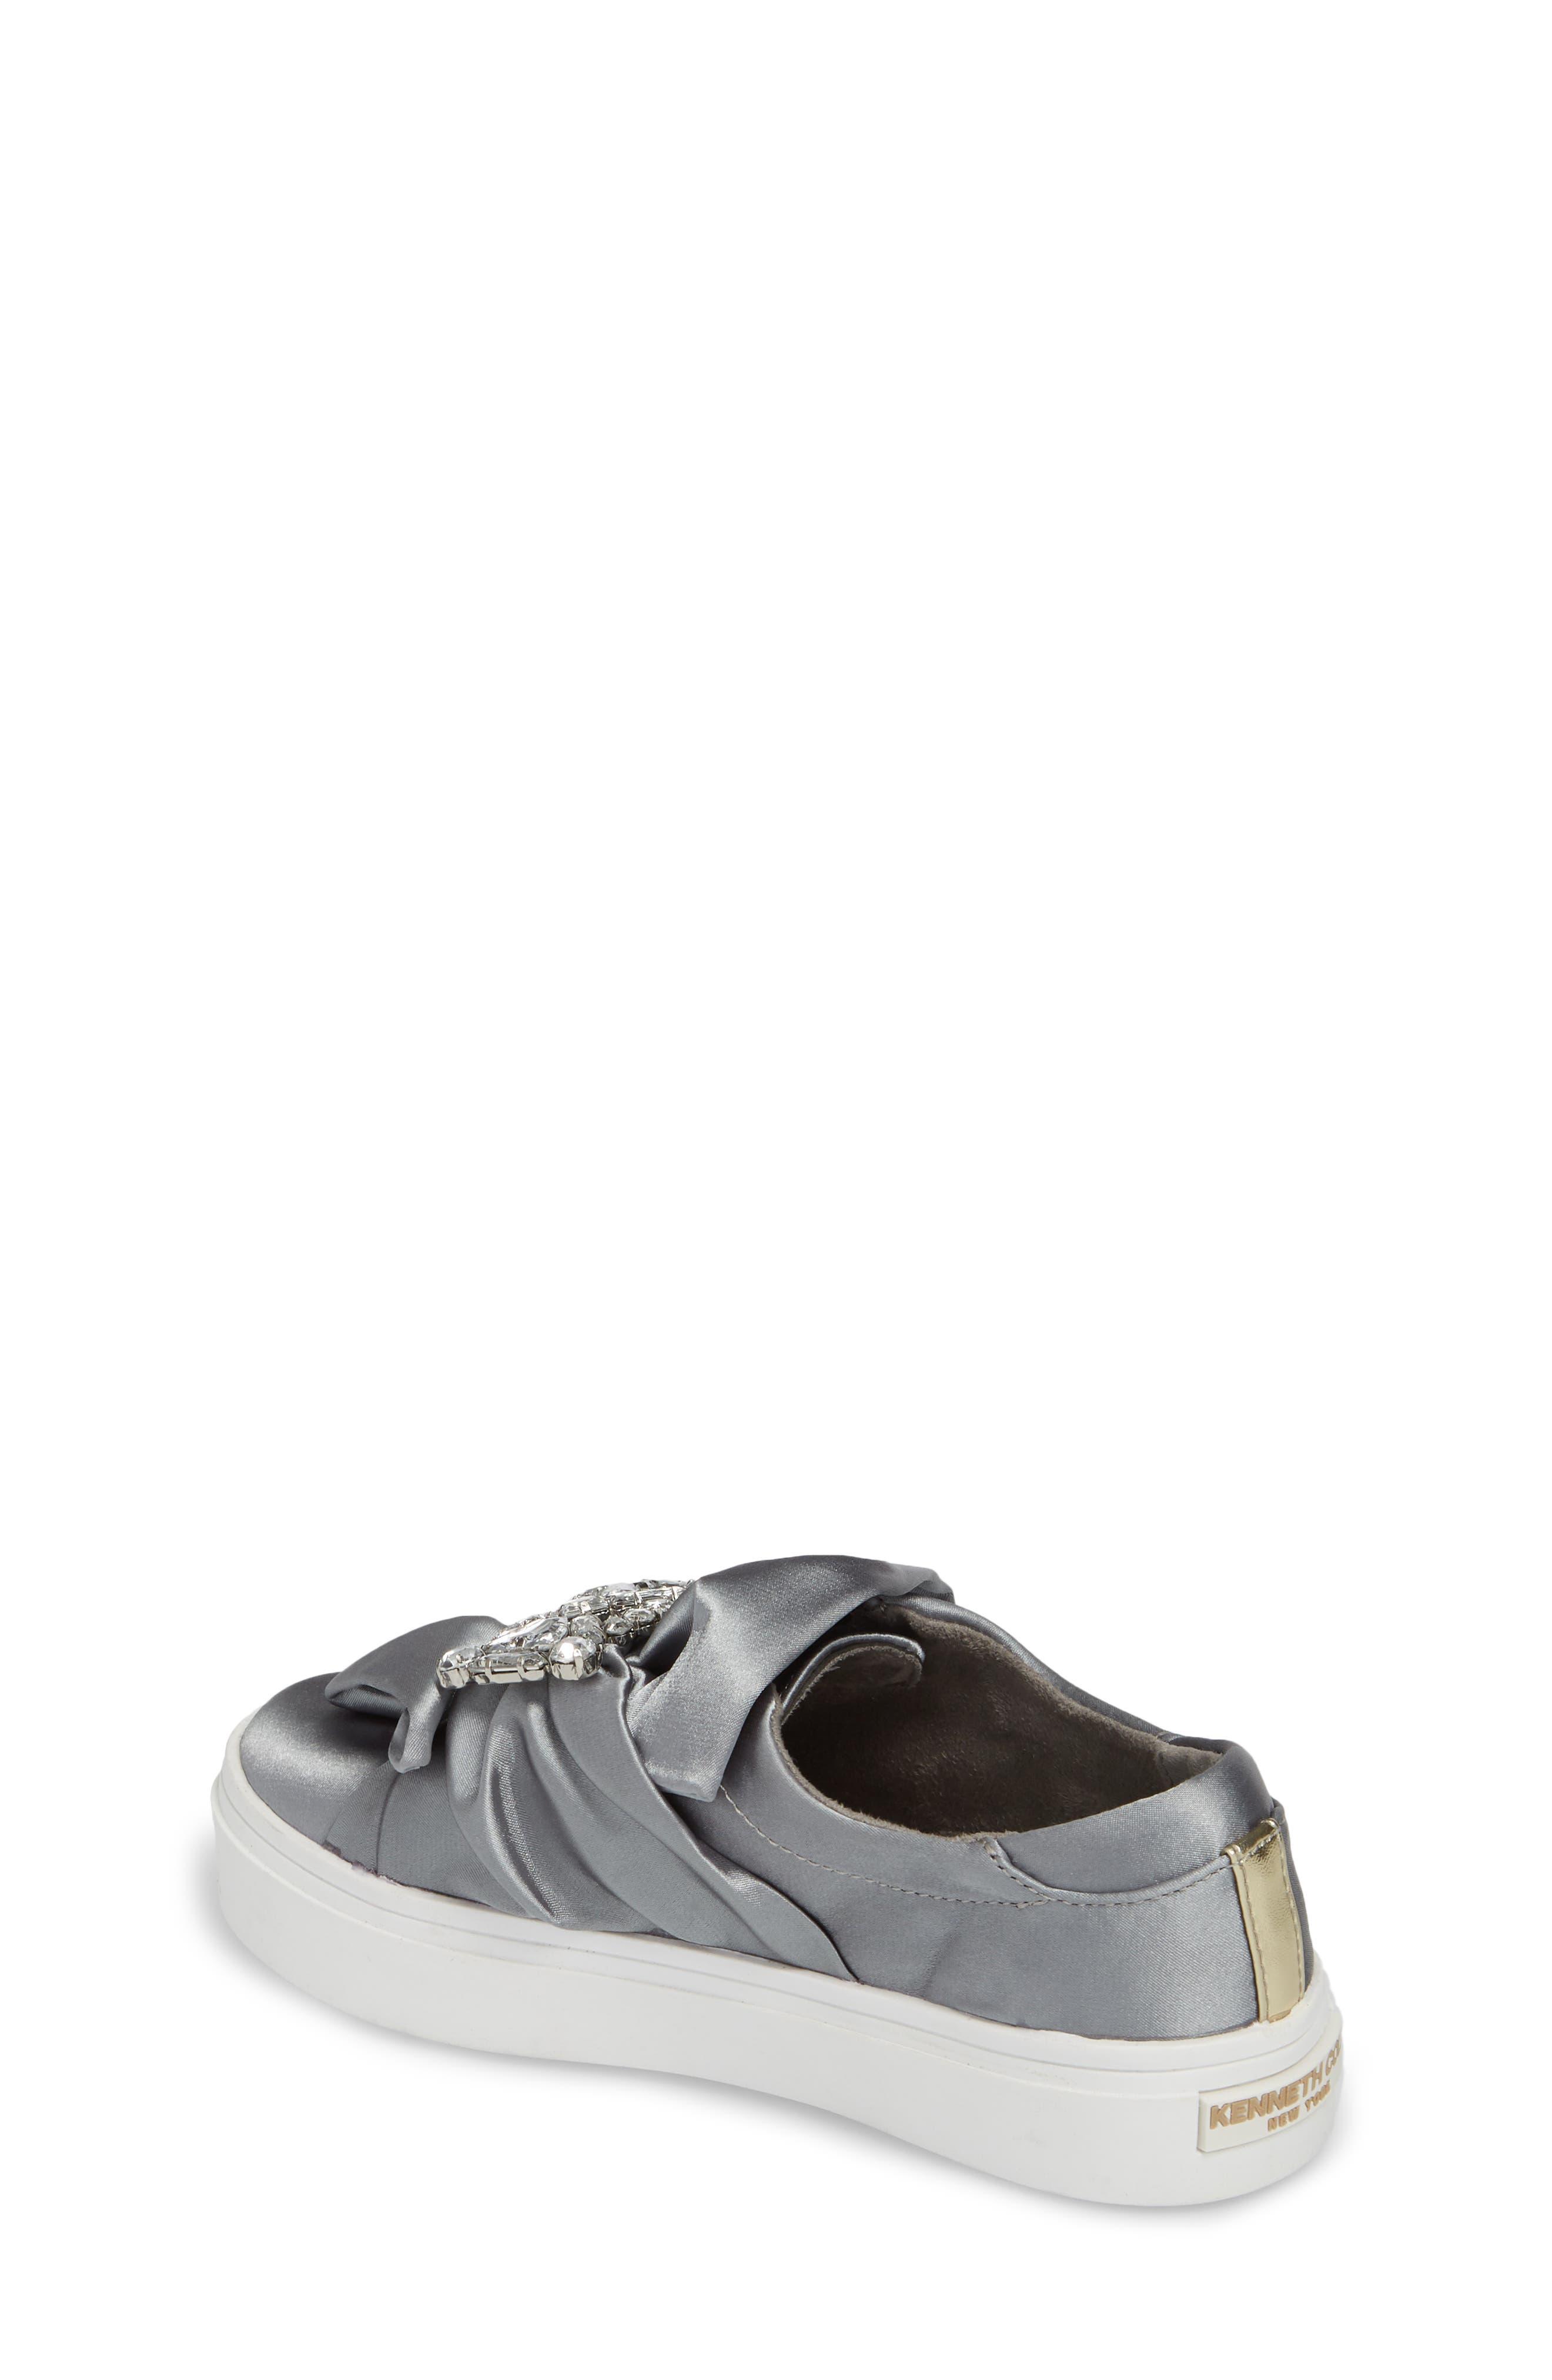 Shout Shine Embellished Sneaker,                             Alternate thumbnail 2, color,                             Gray